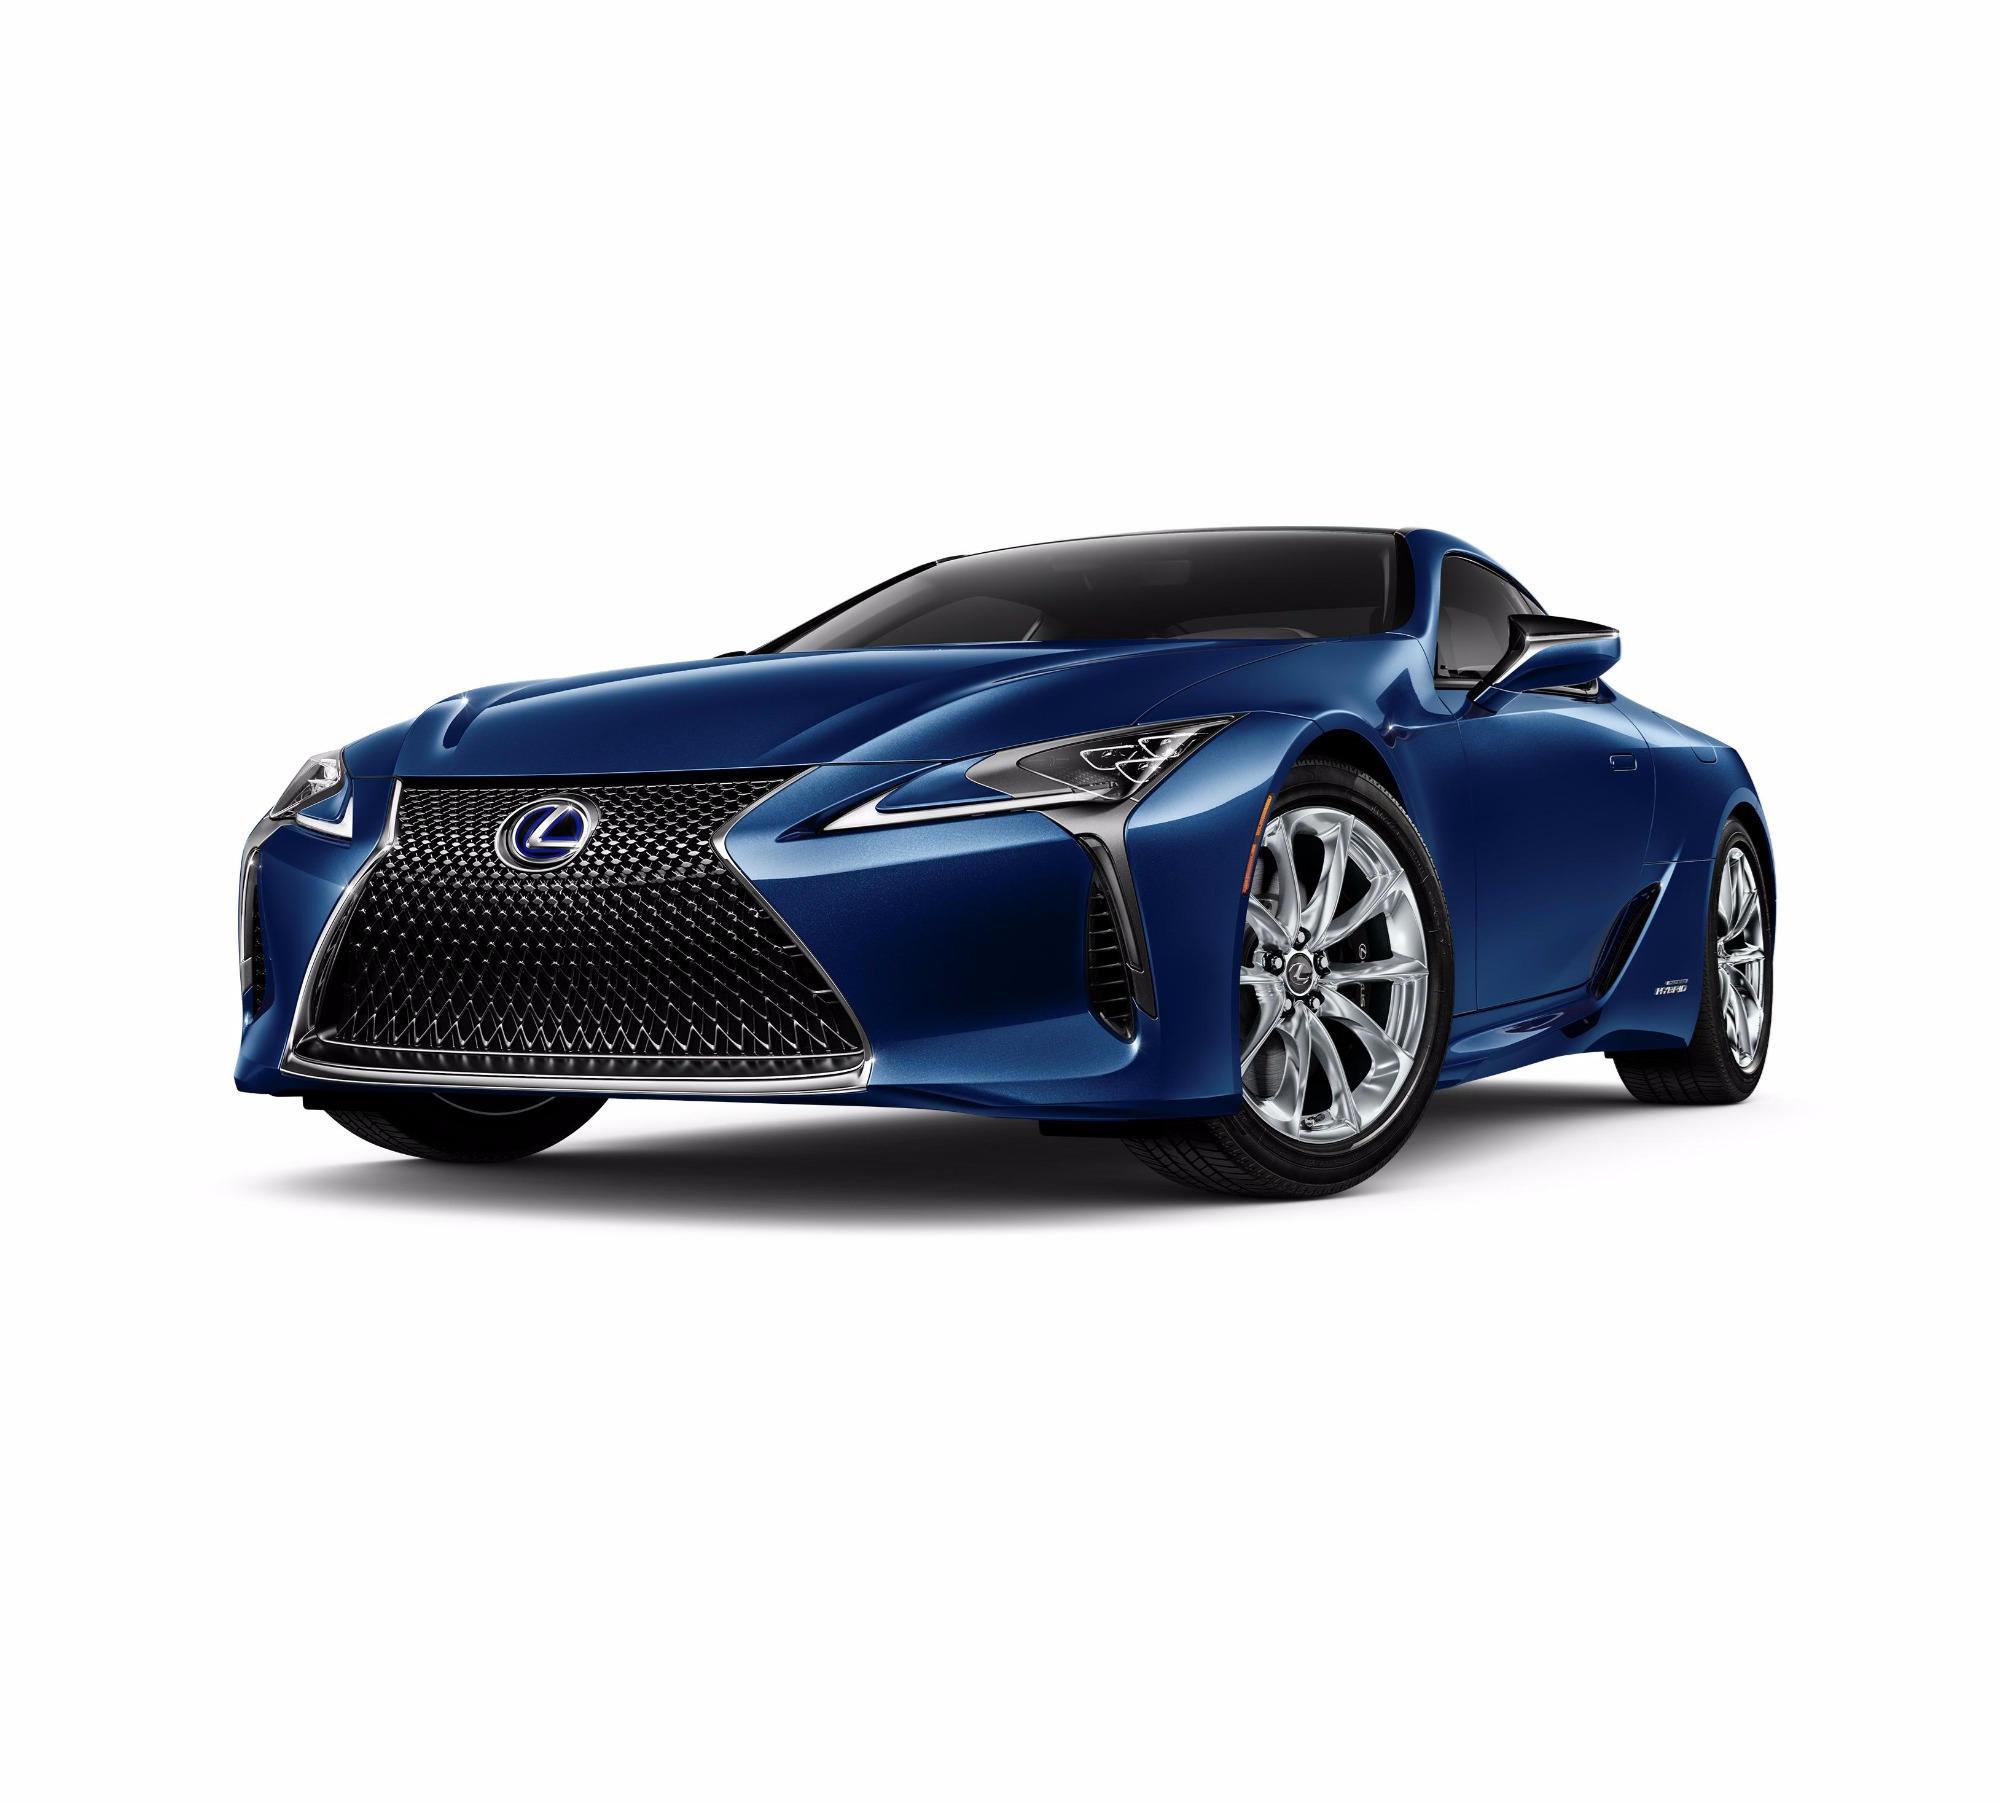 2021 lexus lc 500h full specs features and price  carbuzz